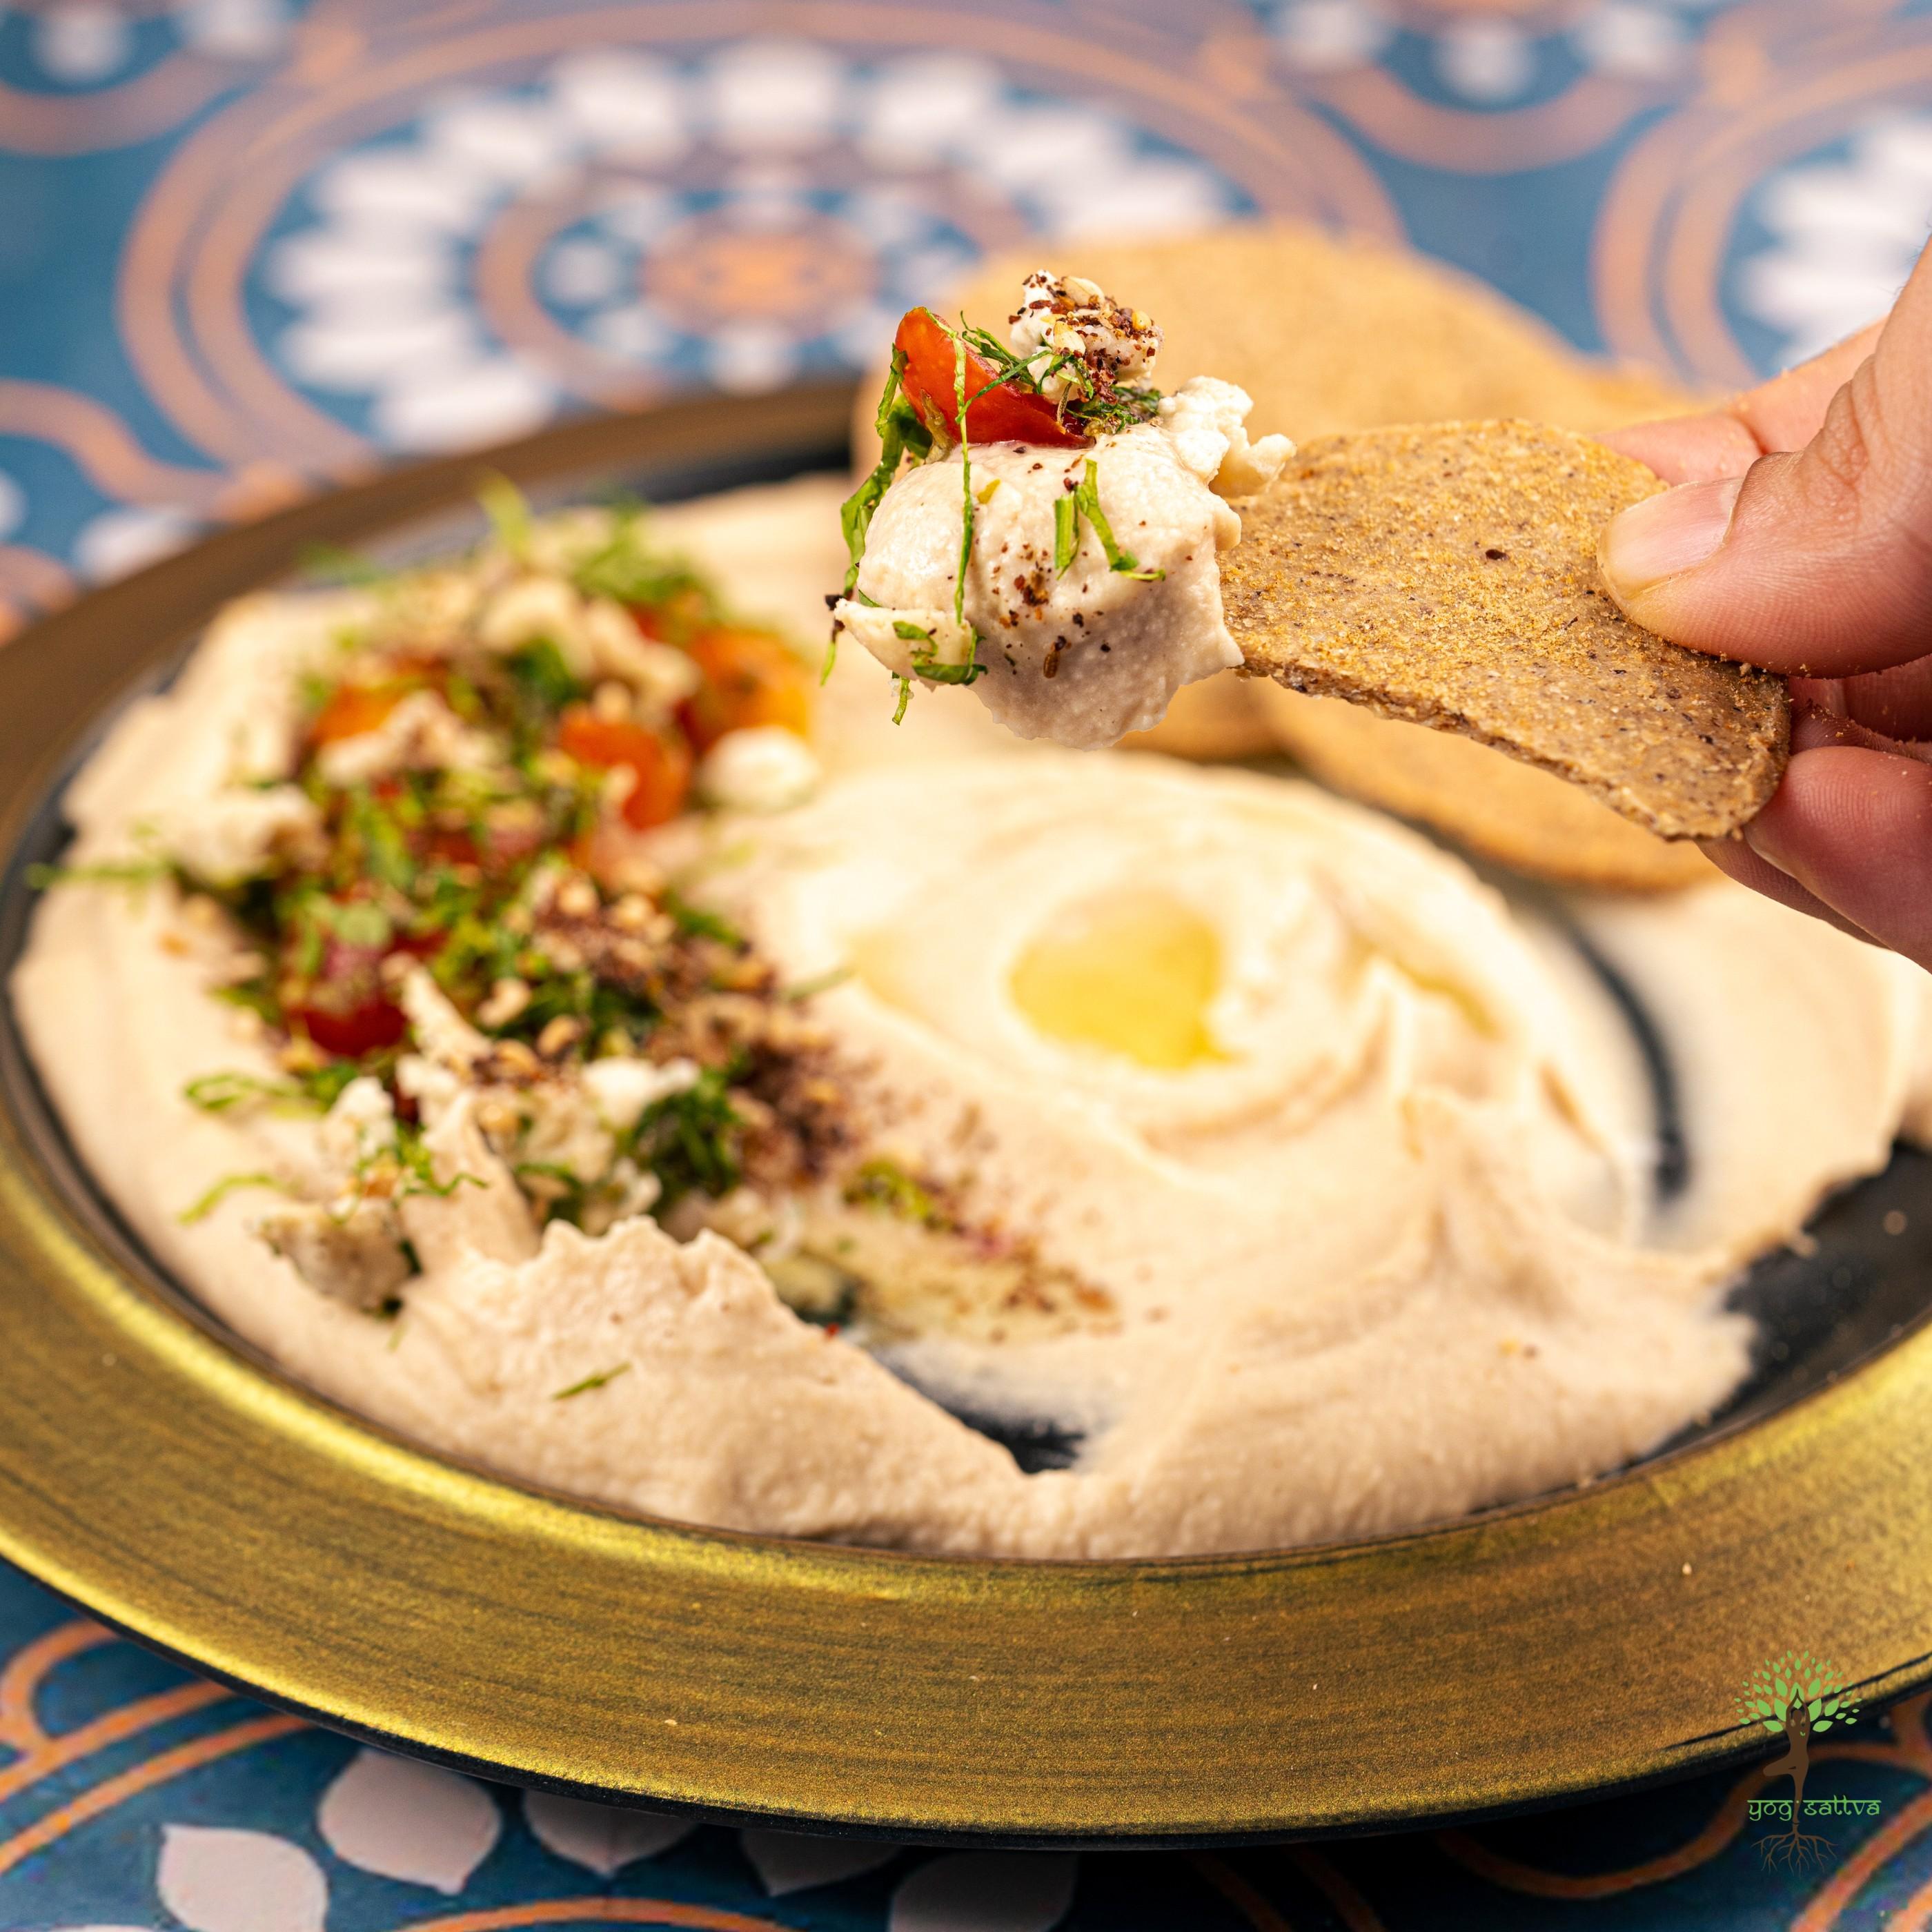 Hummus Beiruty with Gluten Free Zataar Spiced Crackers